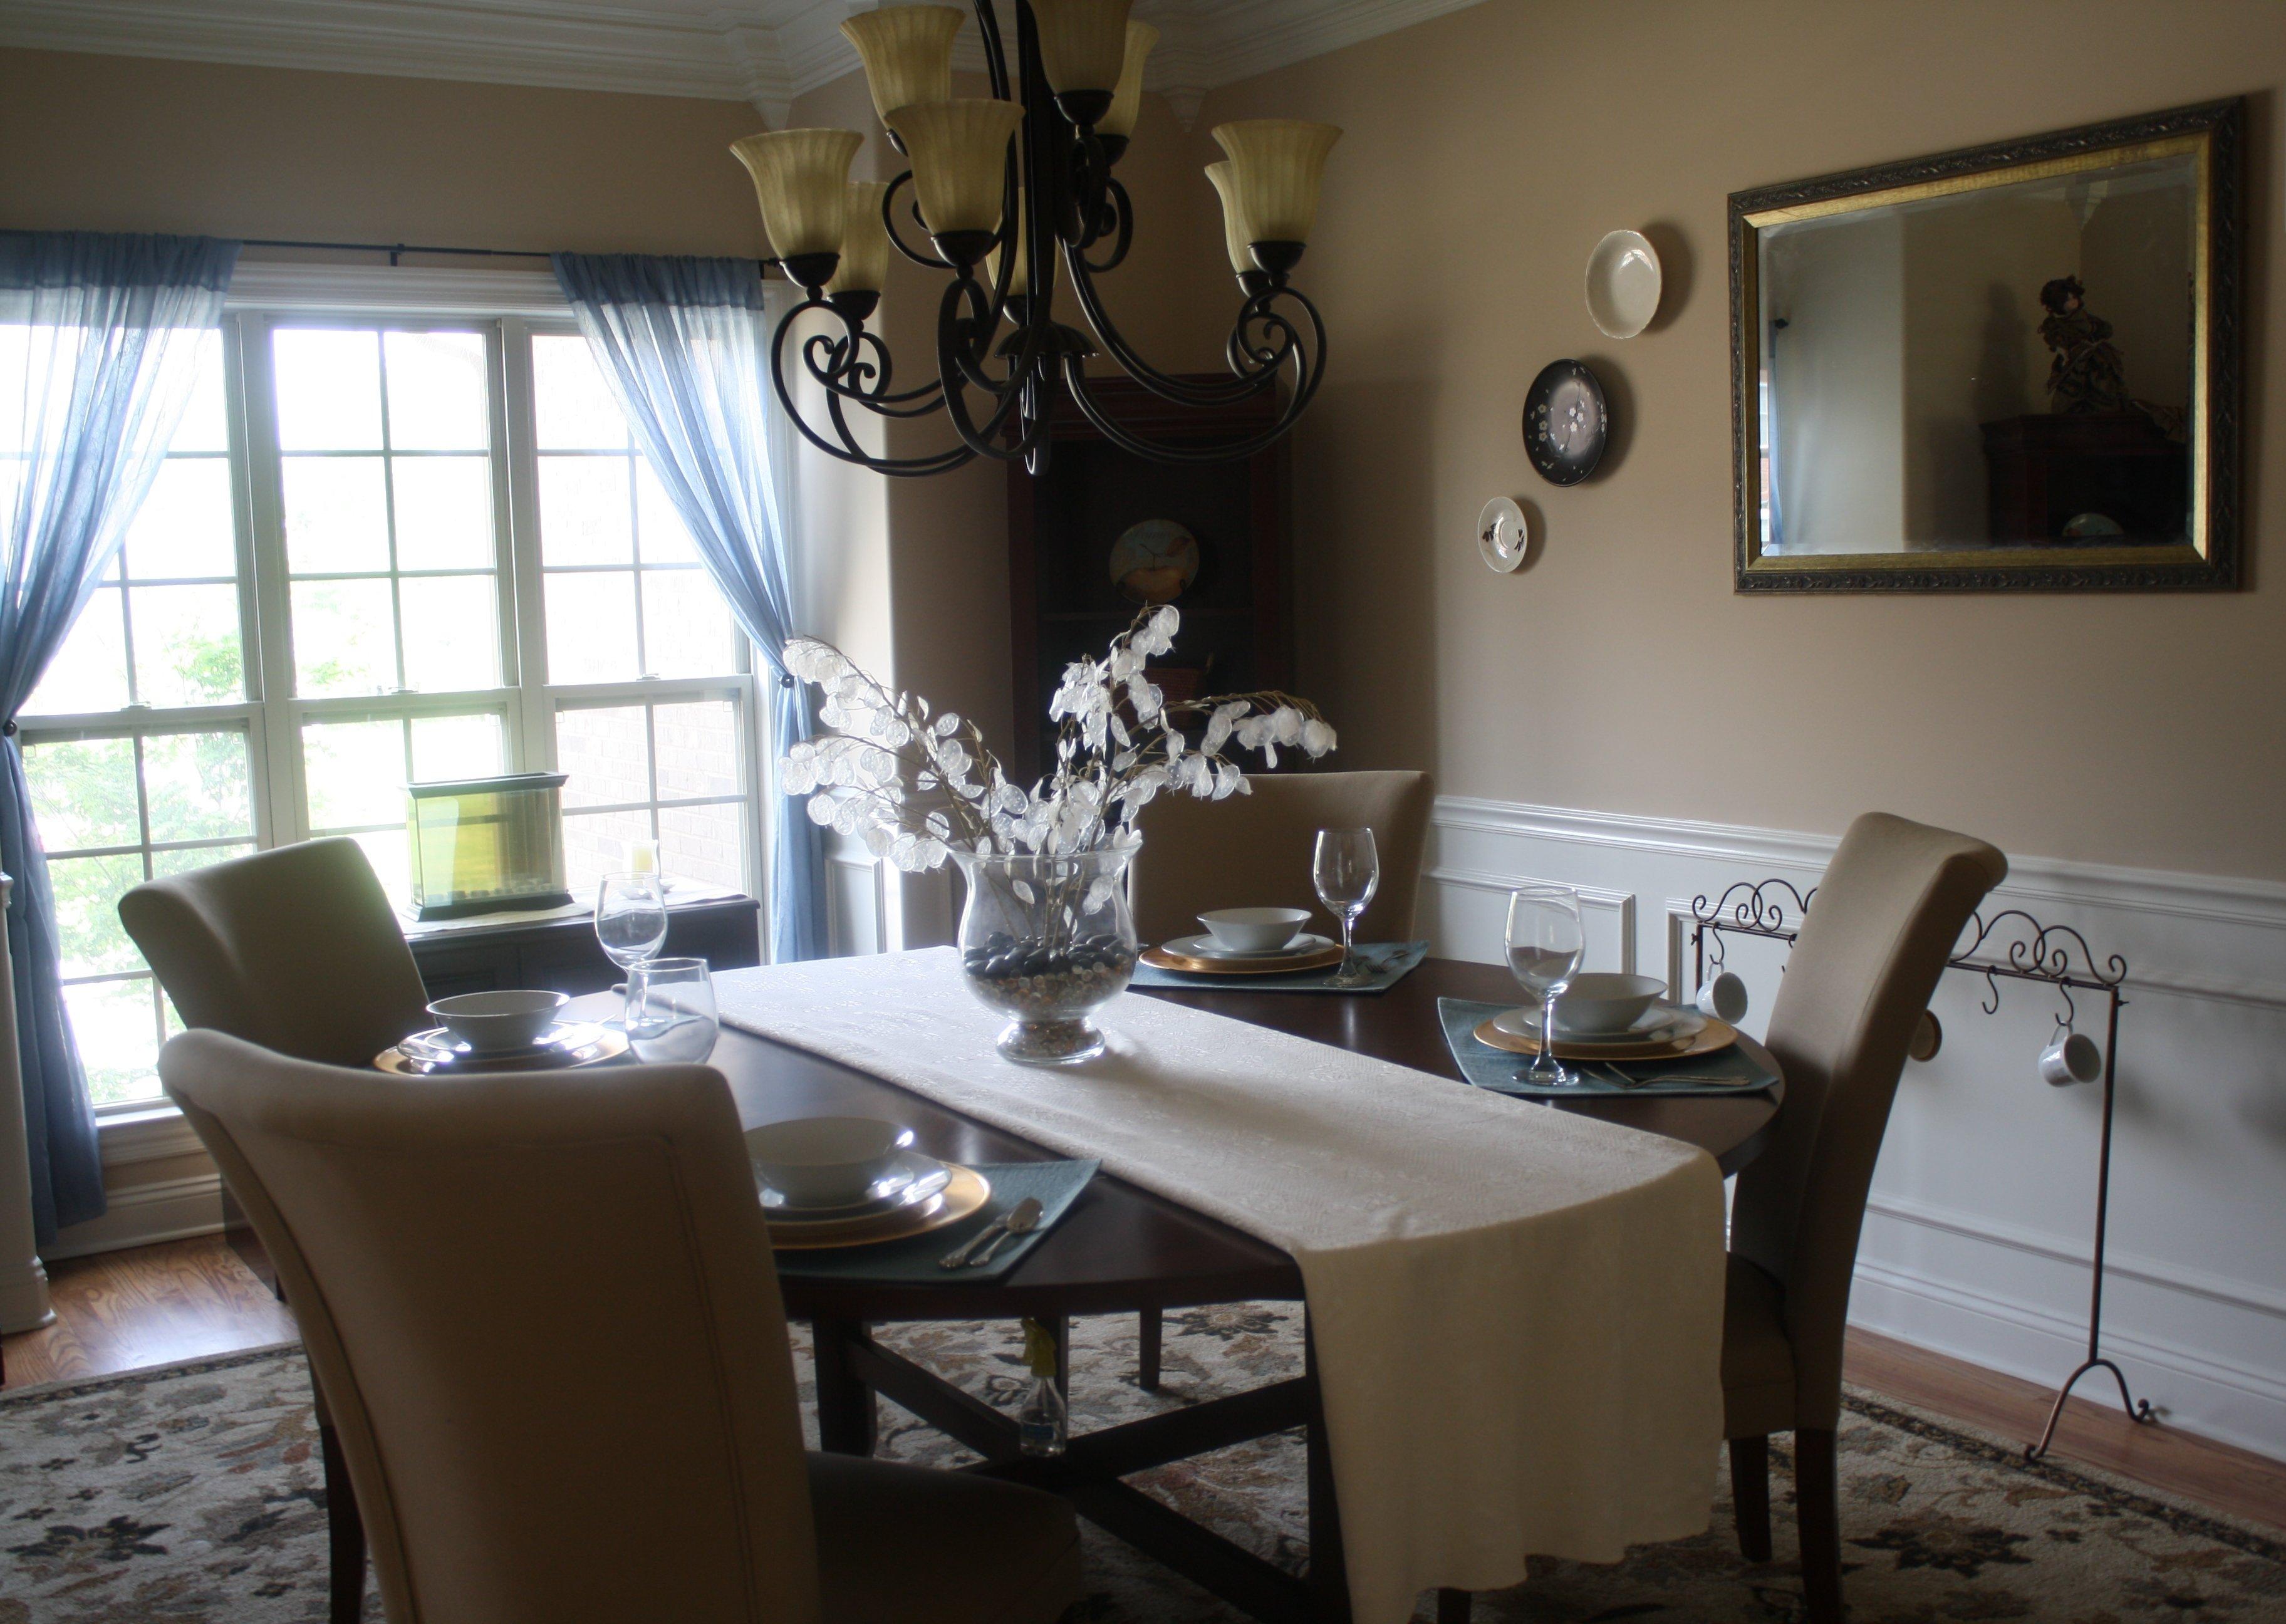 10 Cute Small Formal Living Room Ideas furniture living room dining decorating ideas formal pictures ashley 2021